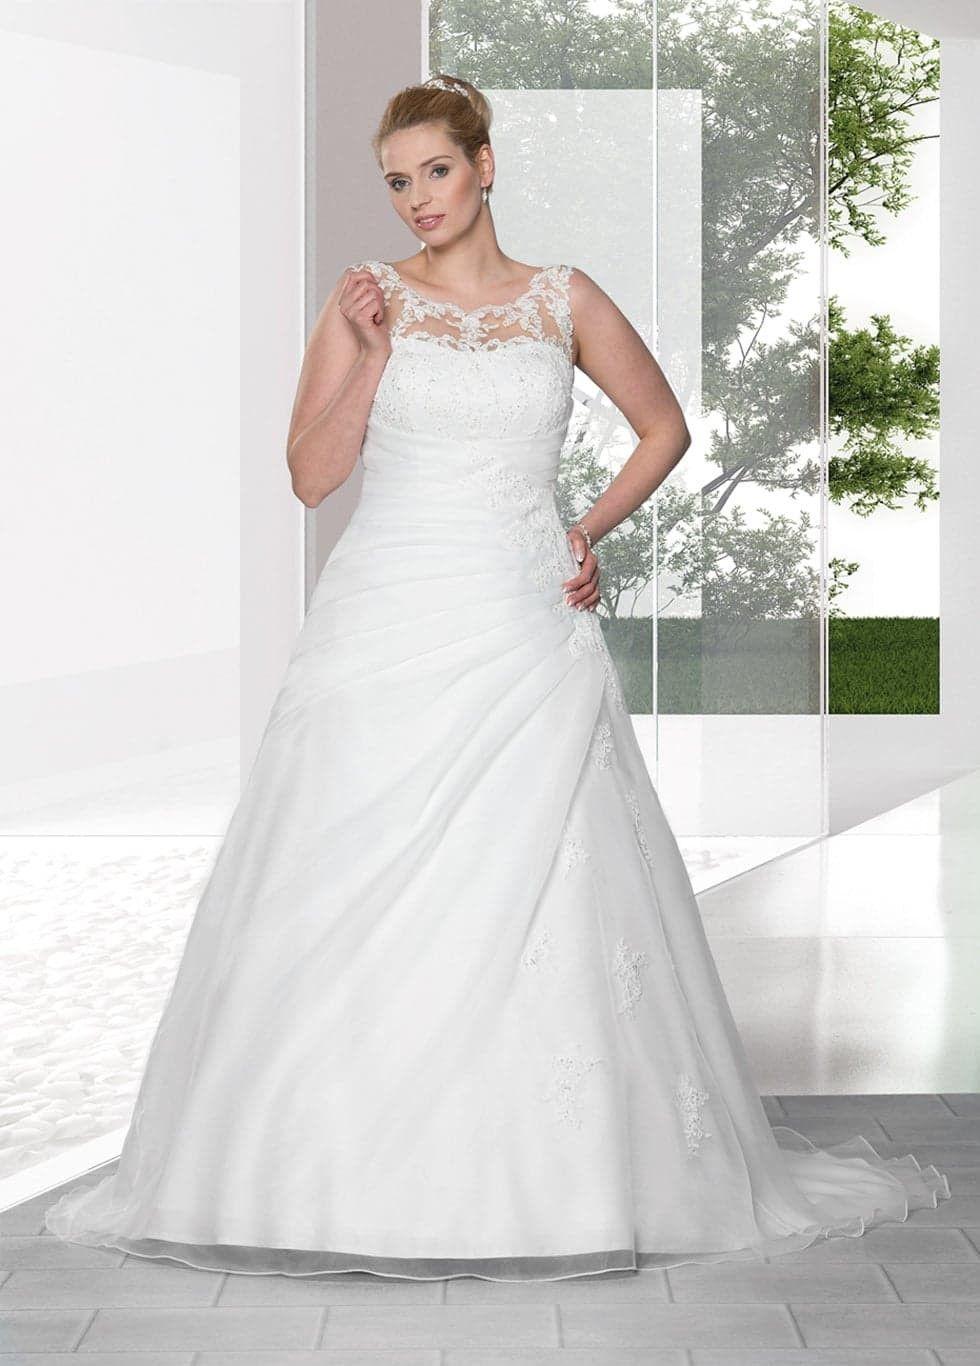 Pin on Dream Wedding!